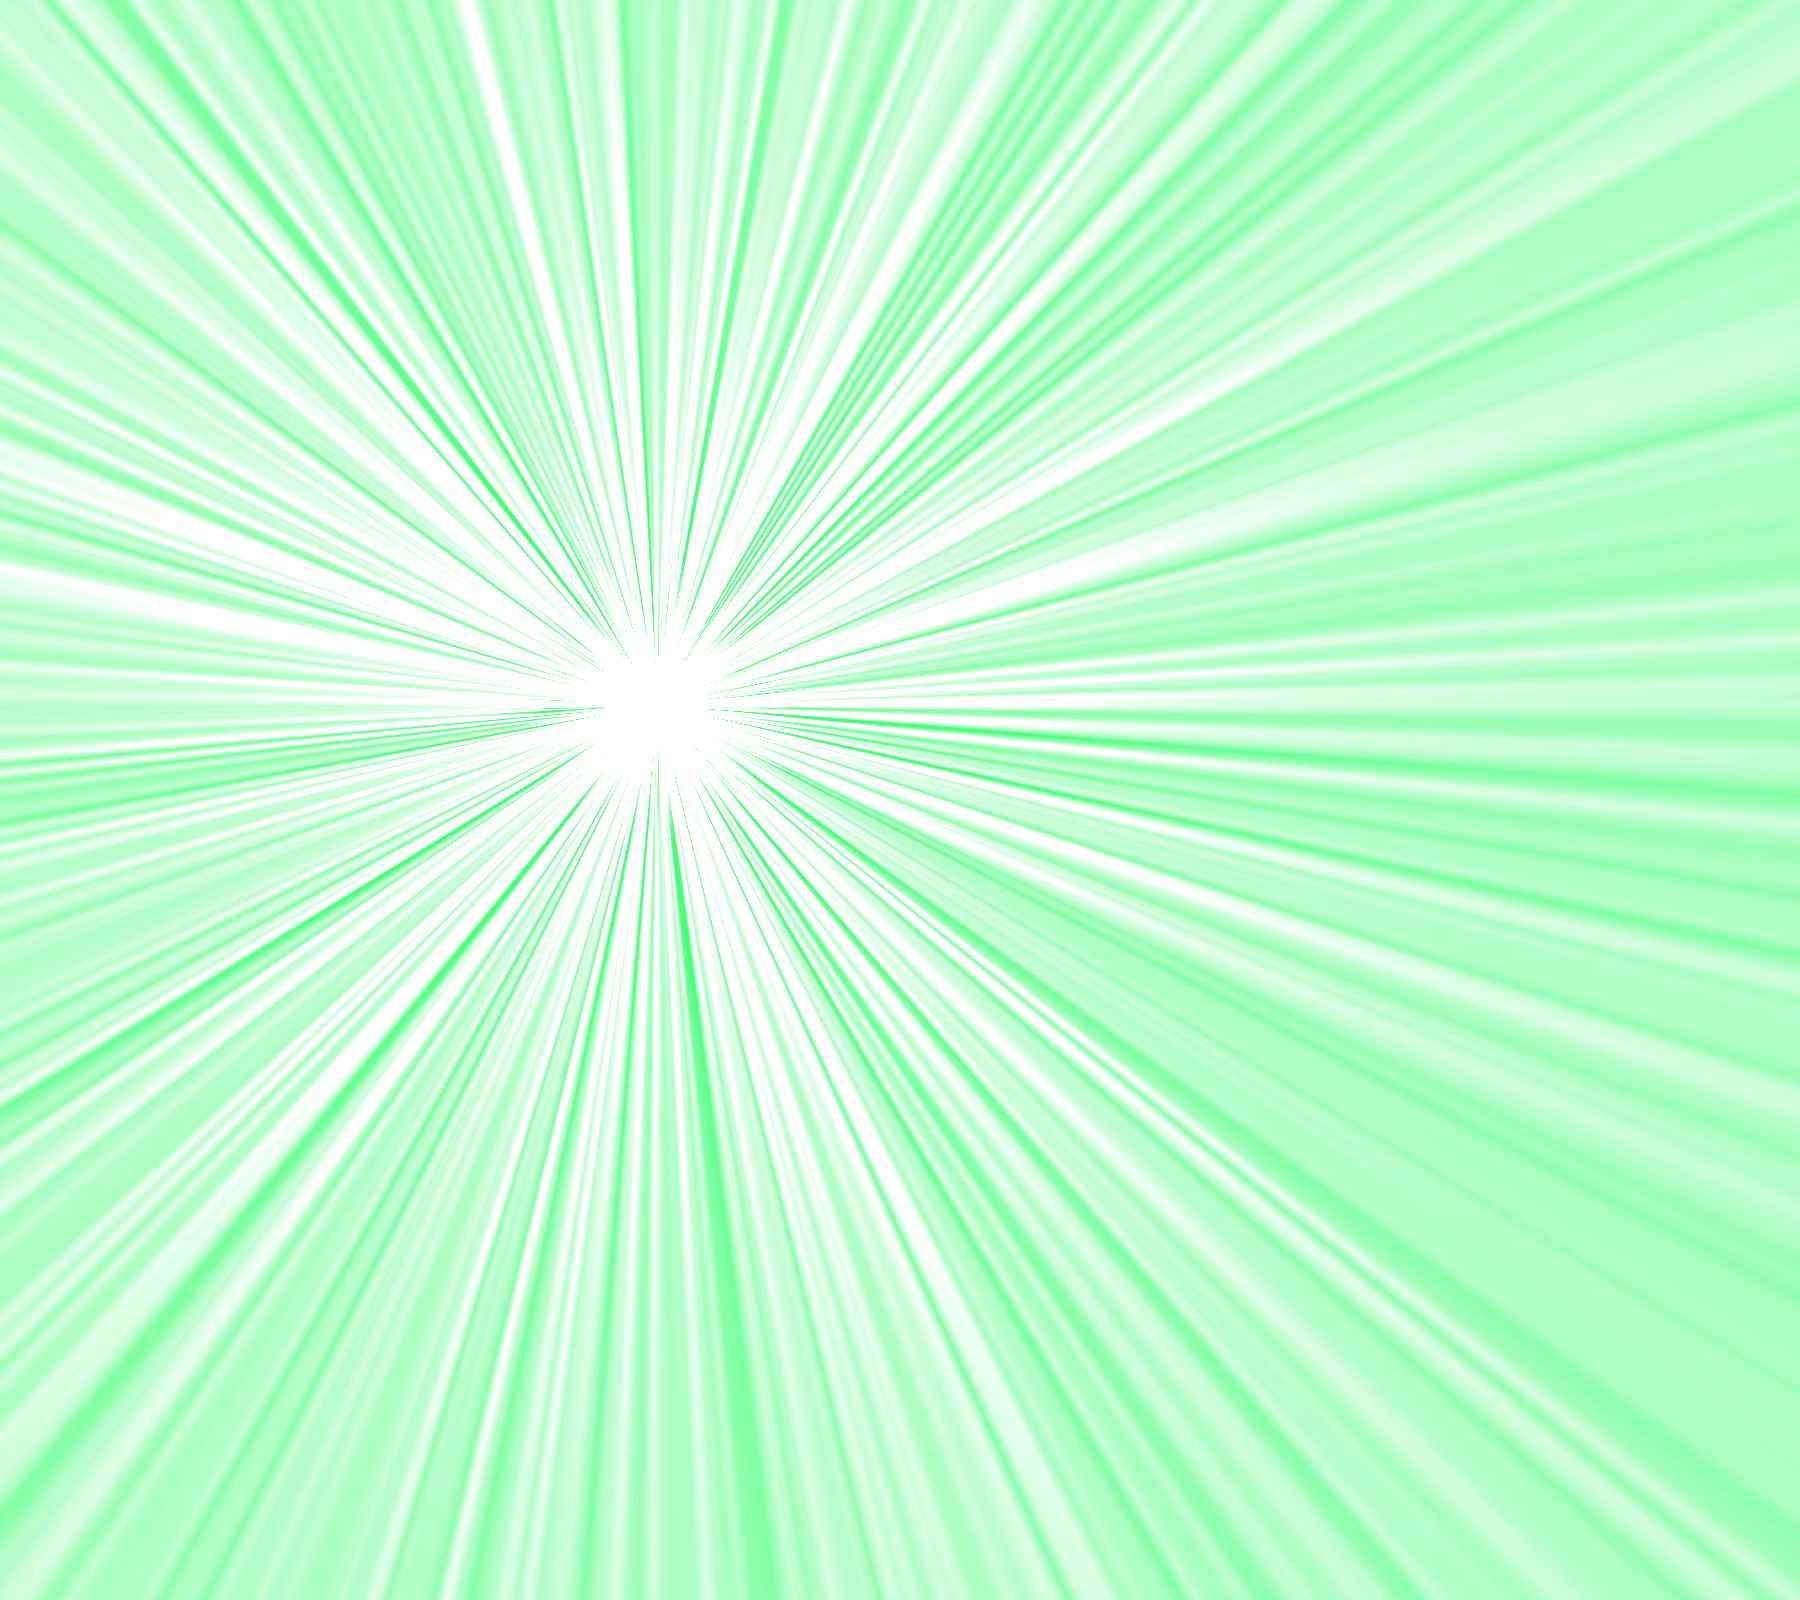 green background designs - photo #15